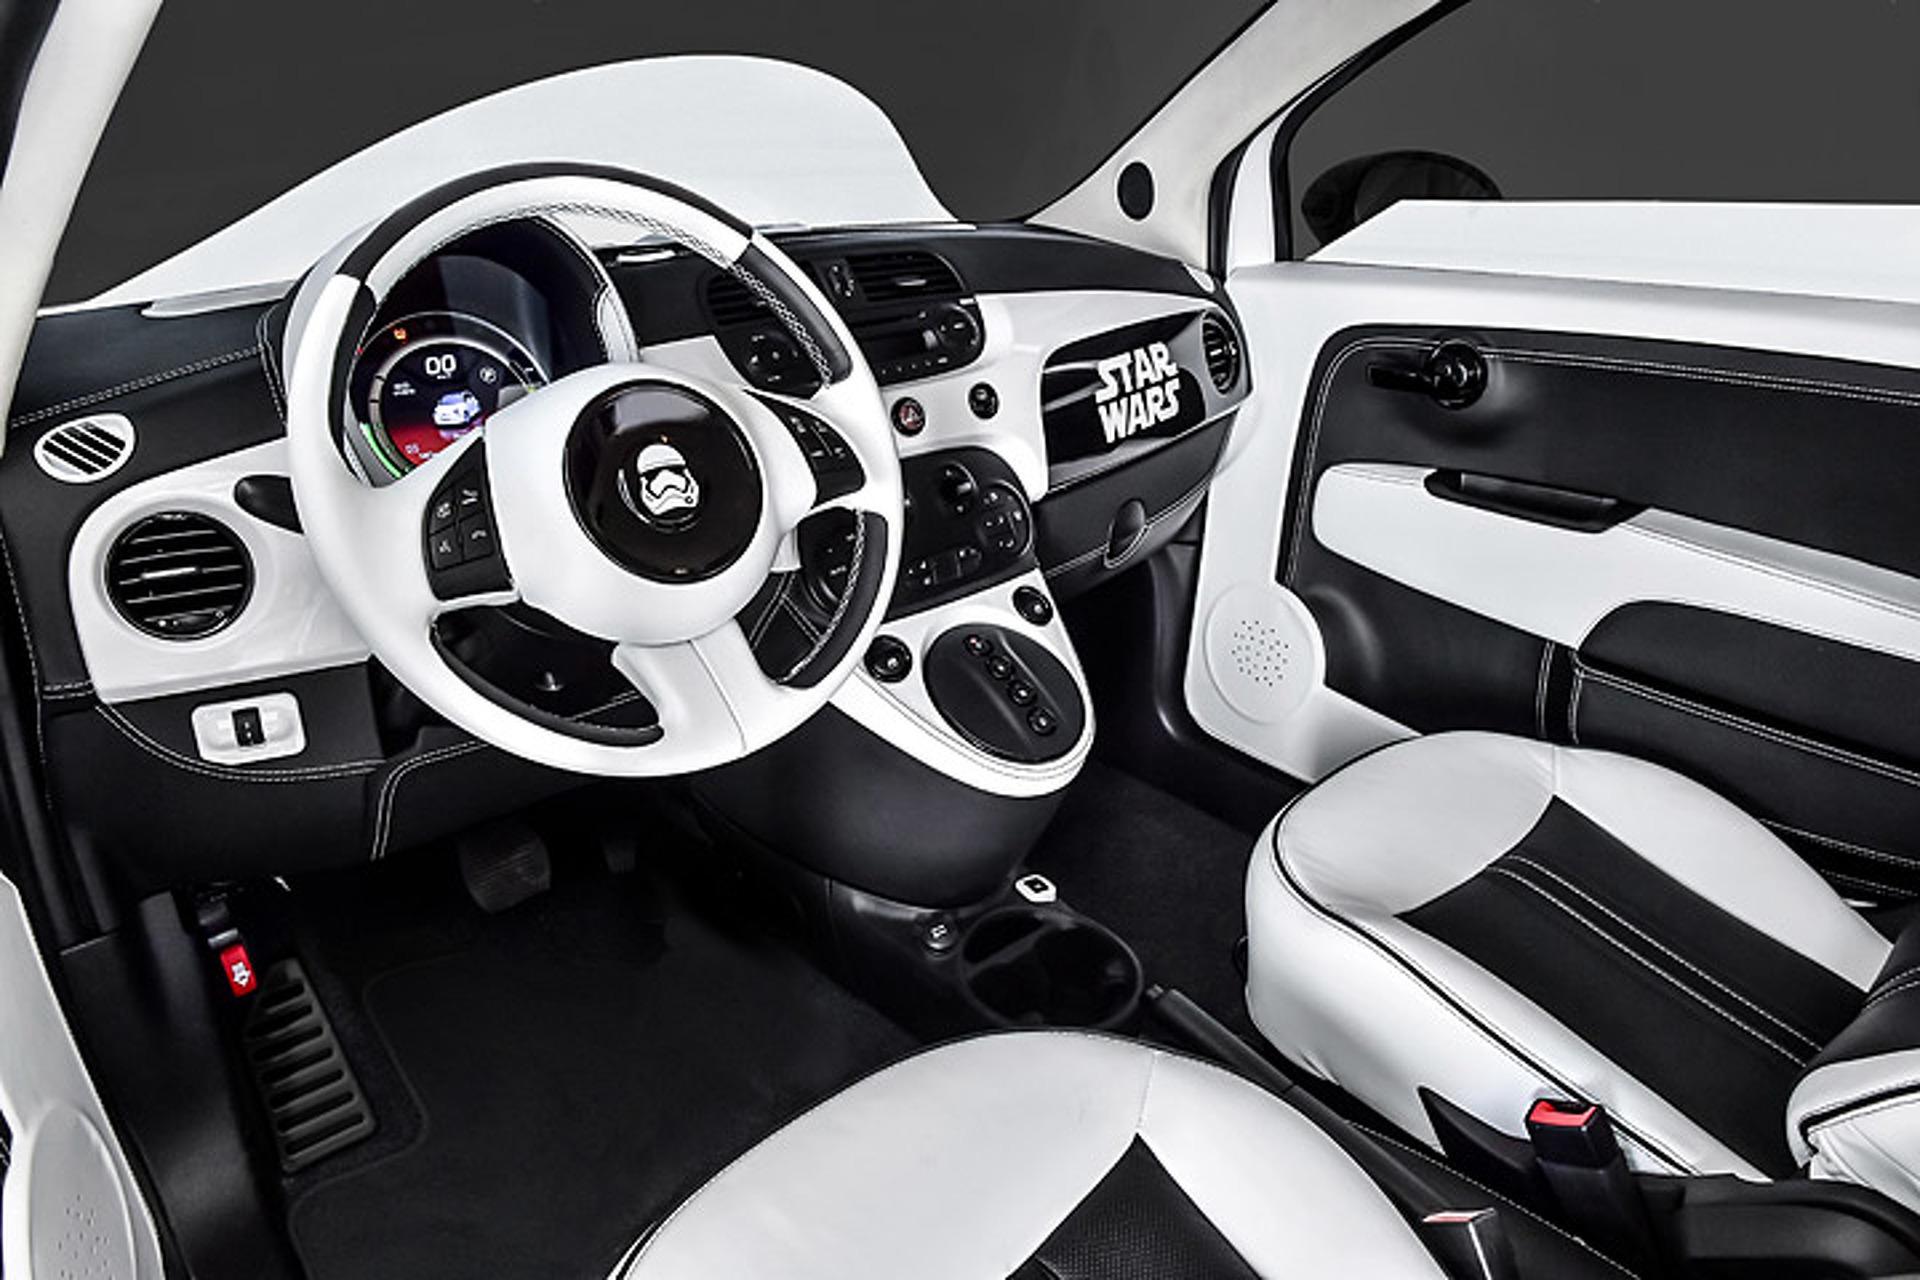 Star Wars Fans, Your Stormtrooper Fiat 500e Awaits